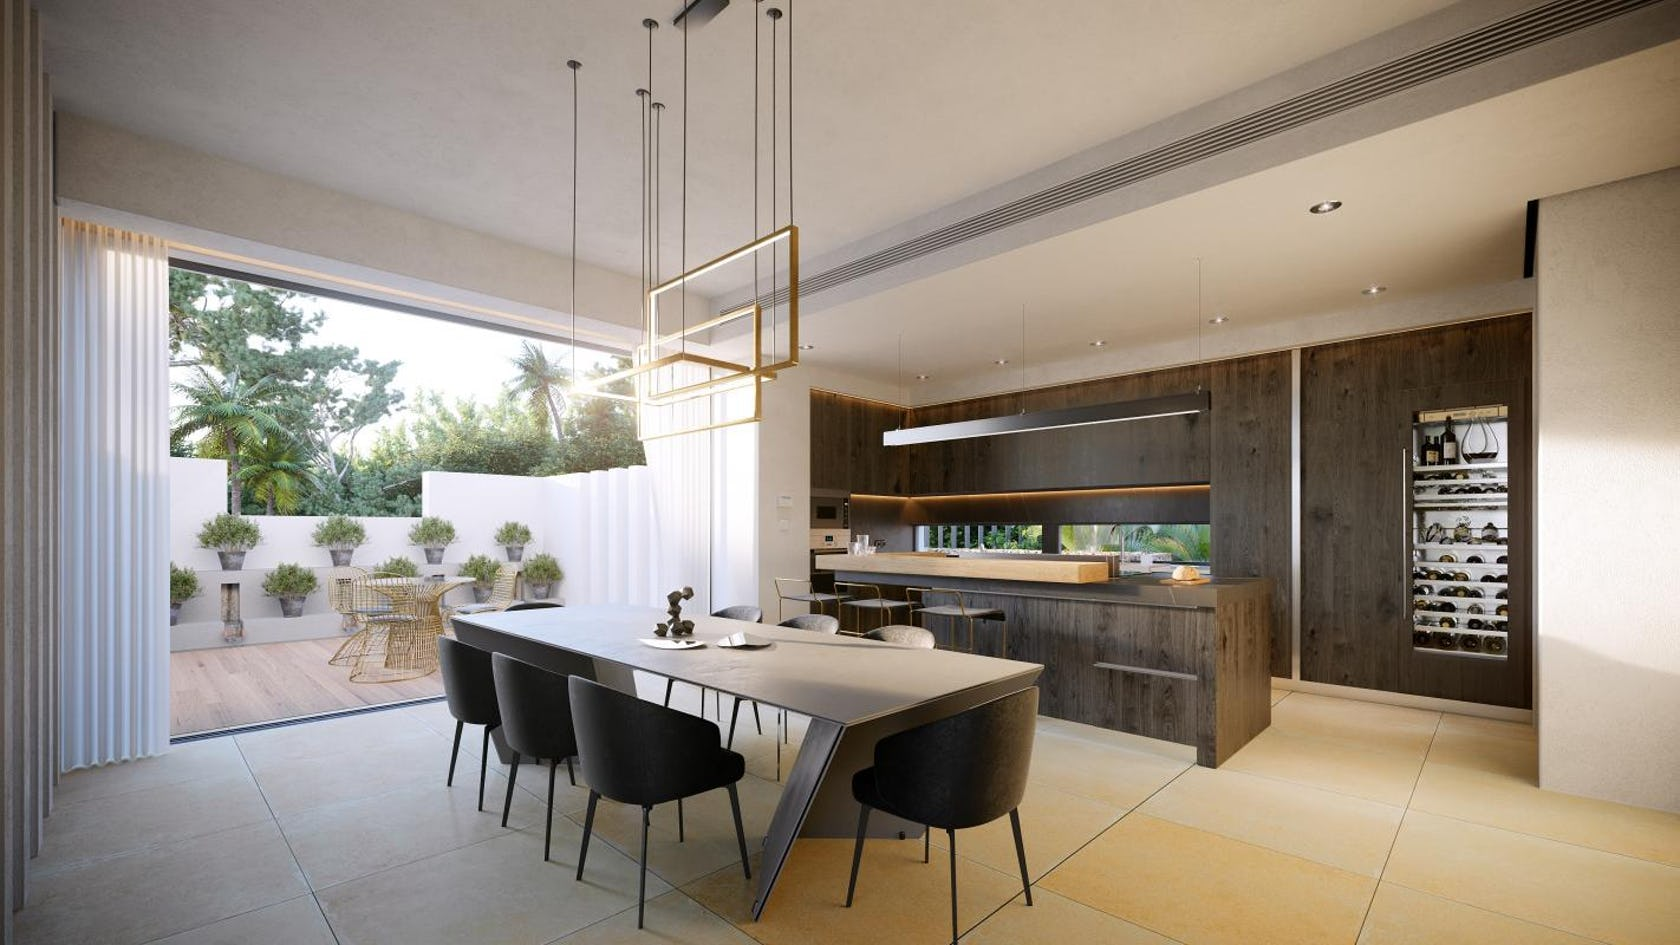 chair furniture interior design indoors restaurant room tabletop